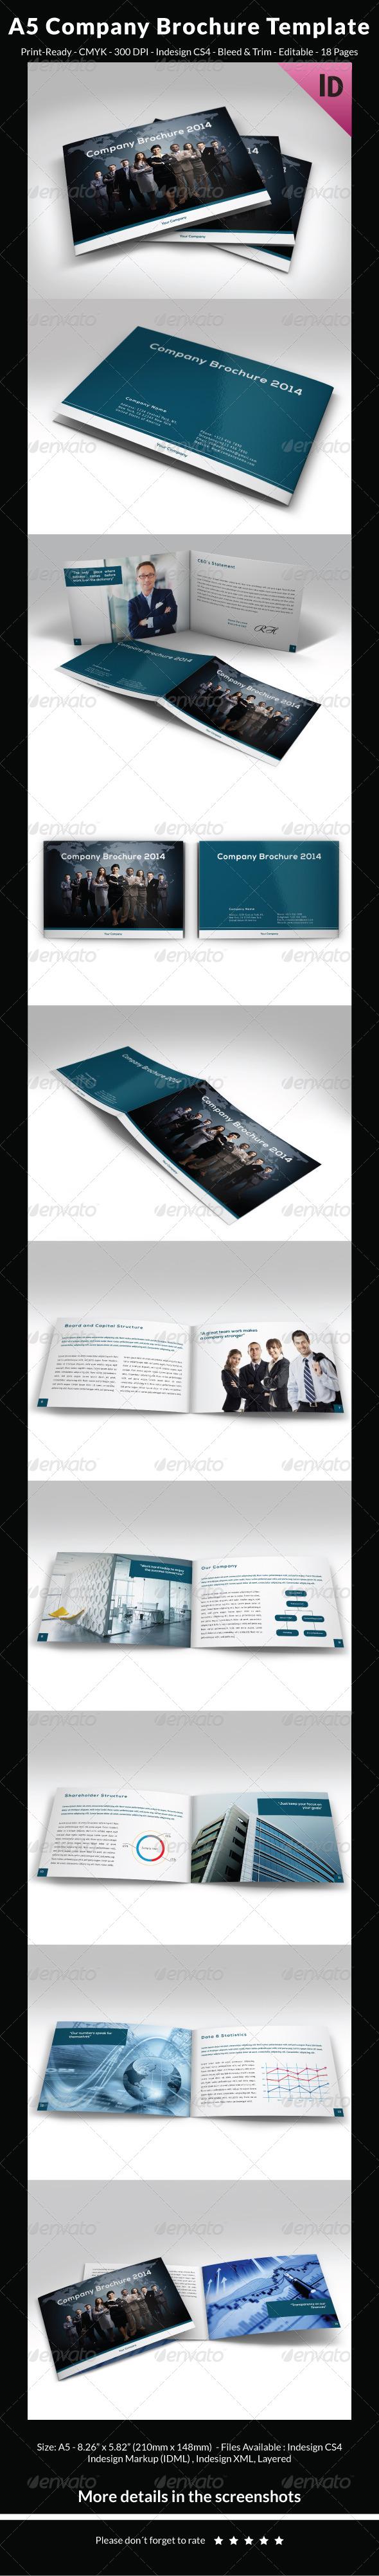 A5 Company Brochure Template - Corporate Brochures